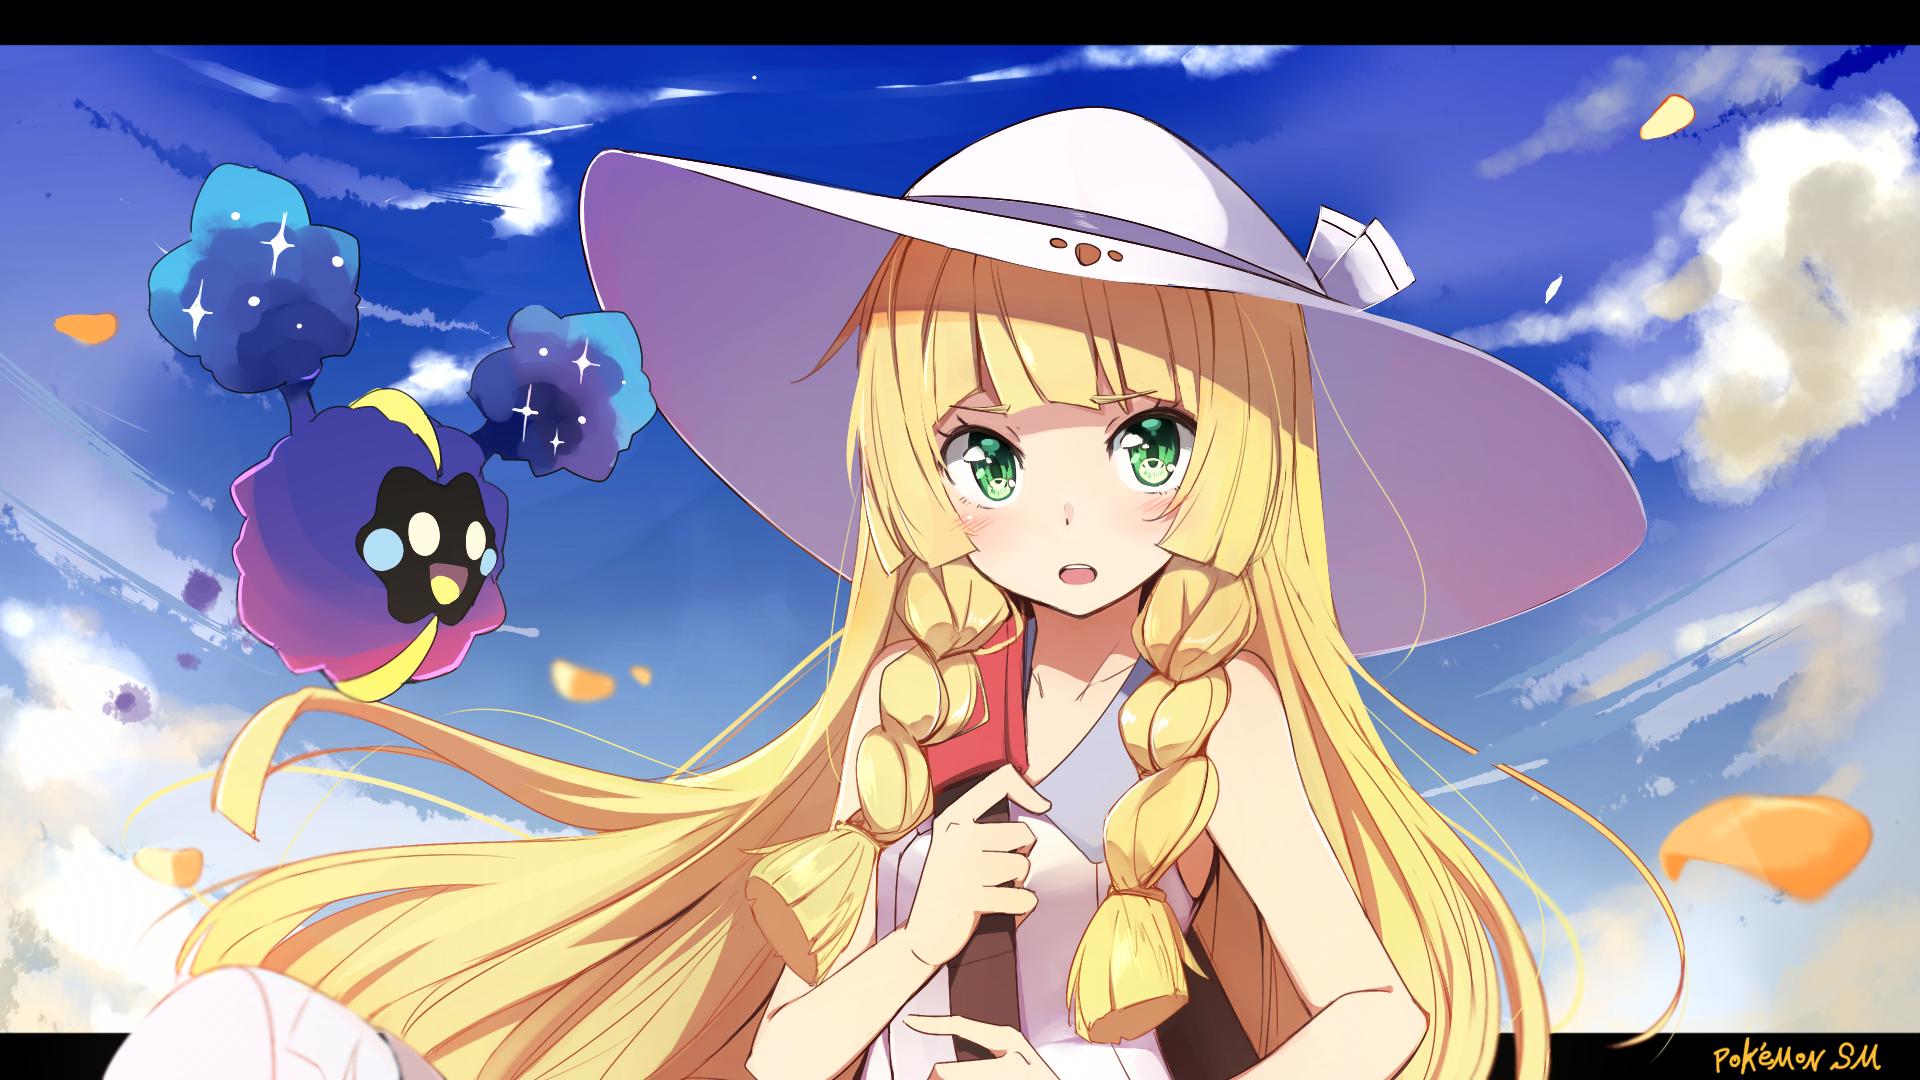 Pokémon: Sun and Moon HD Wallpaper | Background Image ...